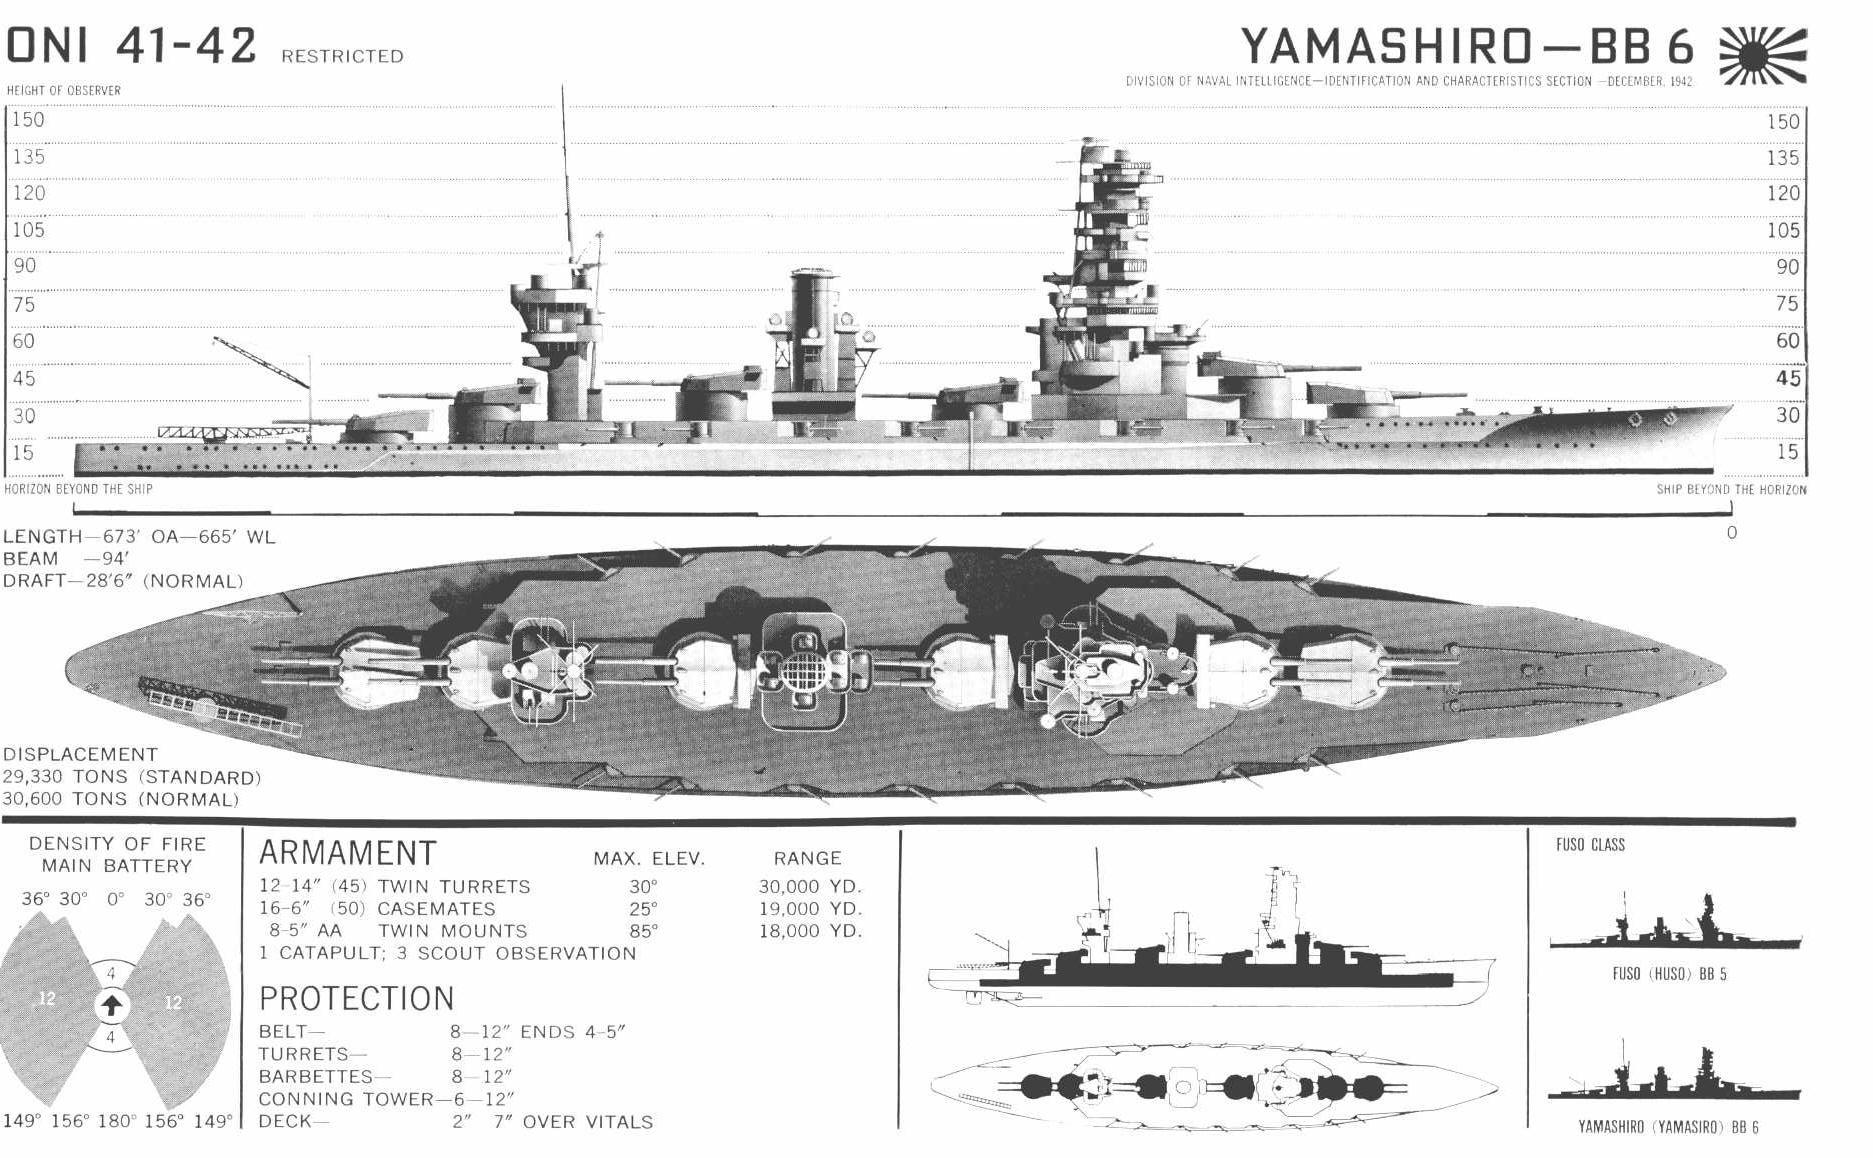 Yamashiro class Battleships